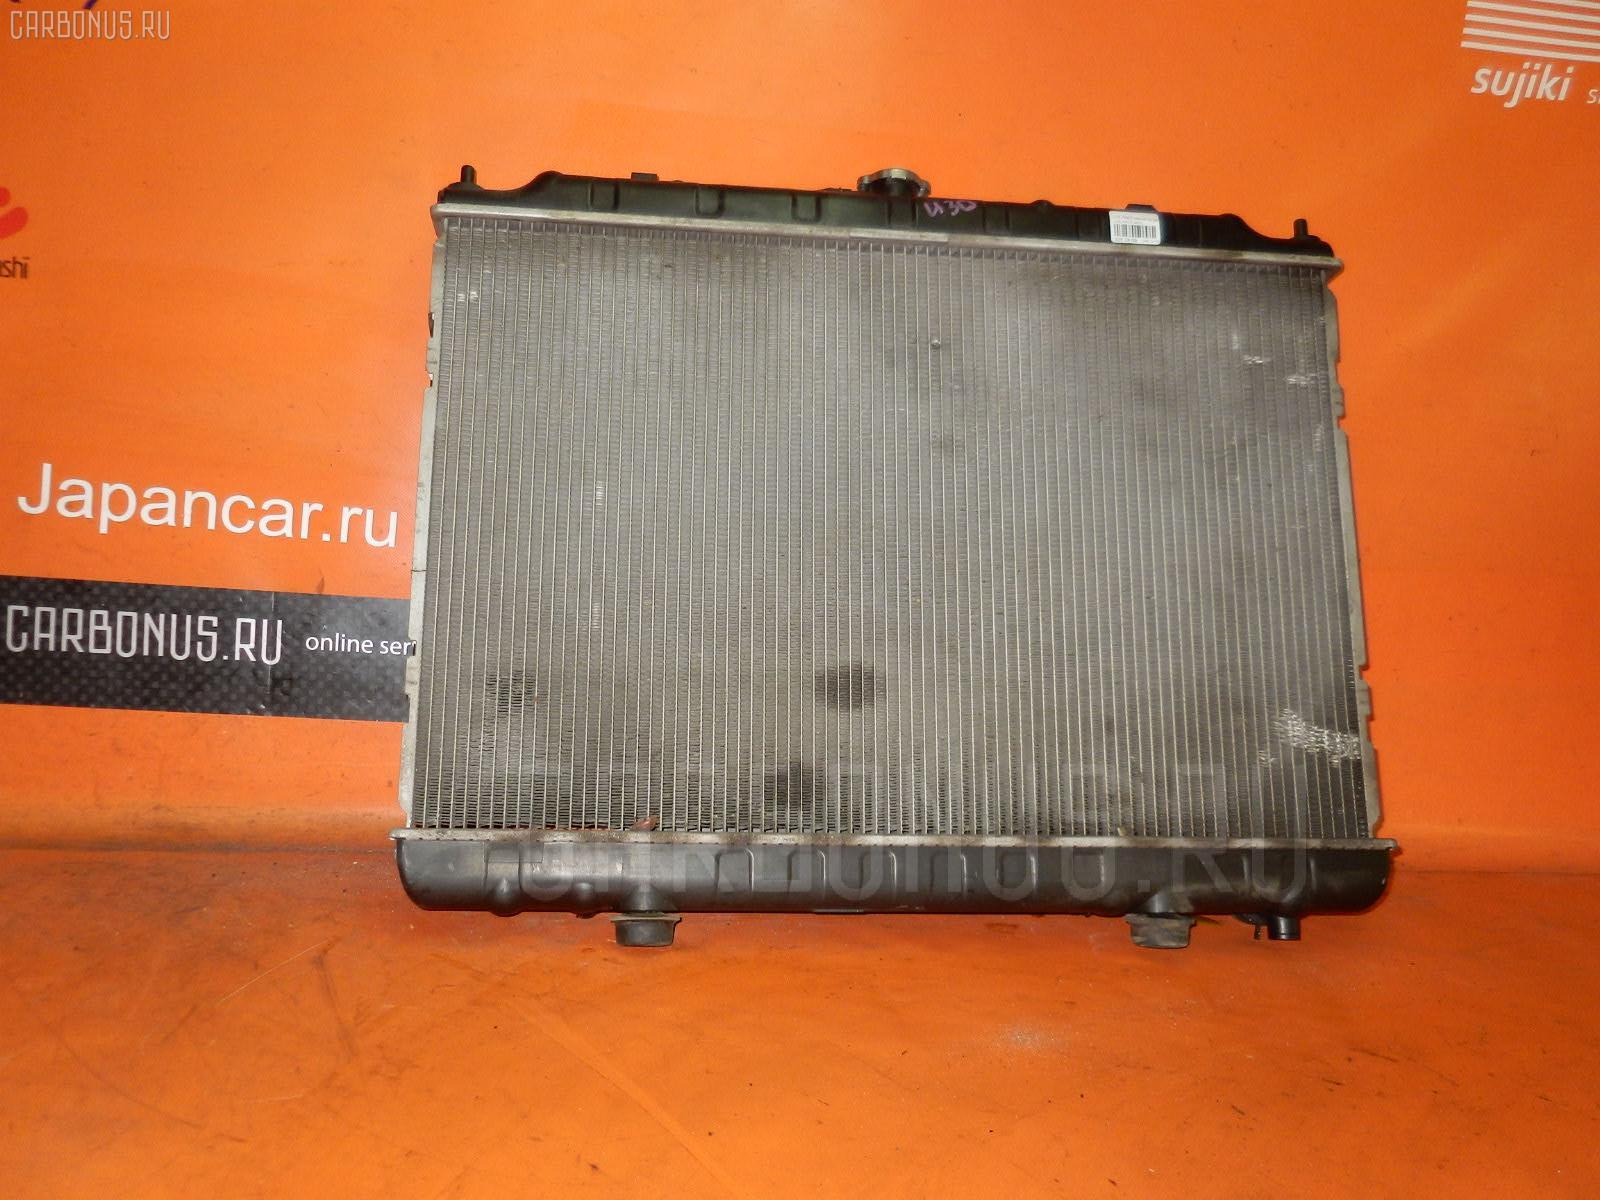 Диффузор радиатора NISSAN PRESAGE U30 KA24DE Фото 2